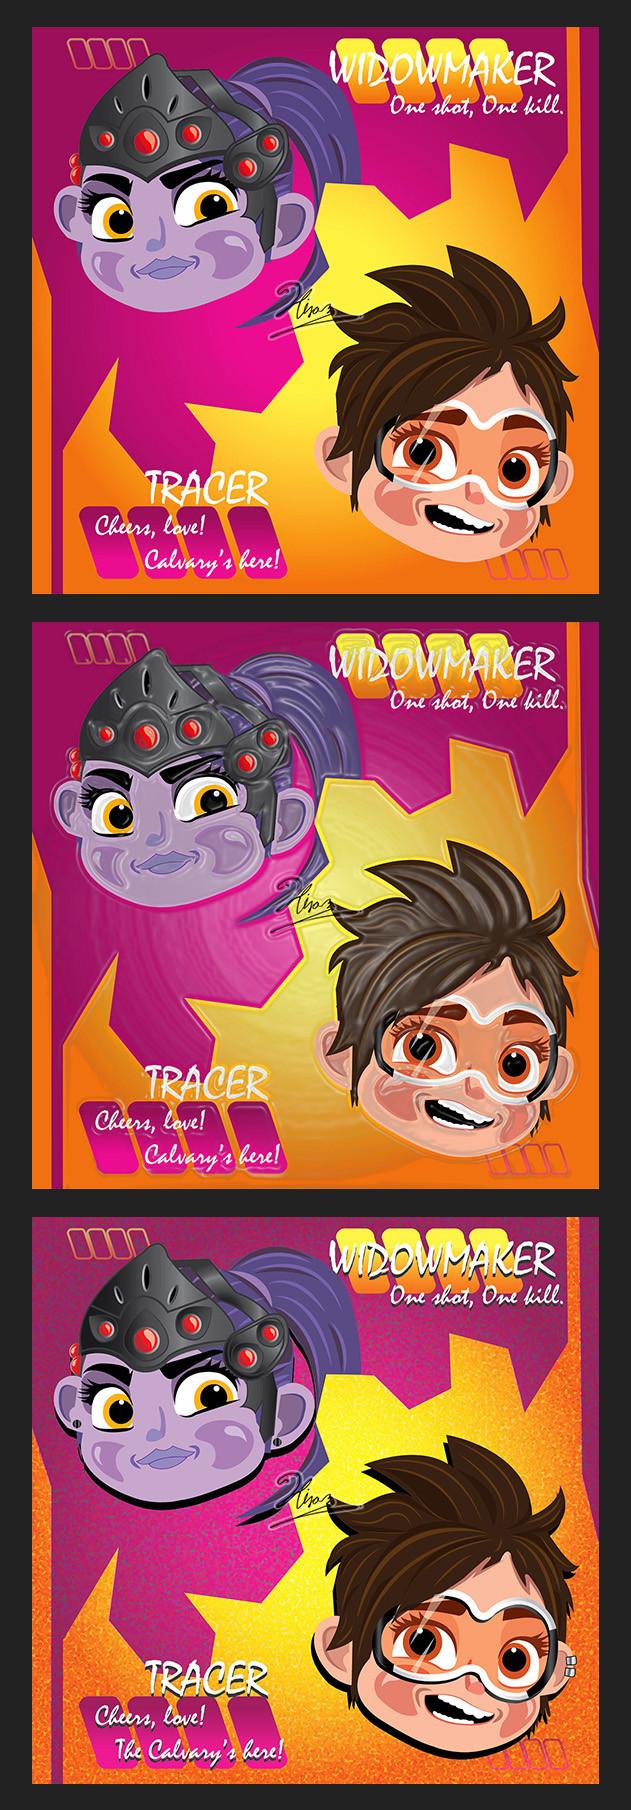 Hiram Luna Tracer And Widowmaker